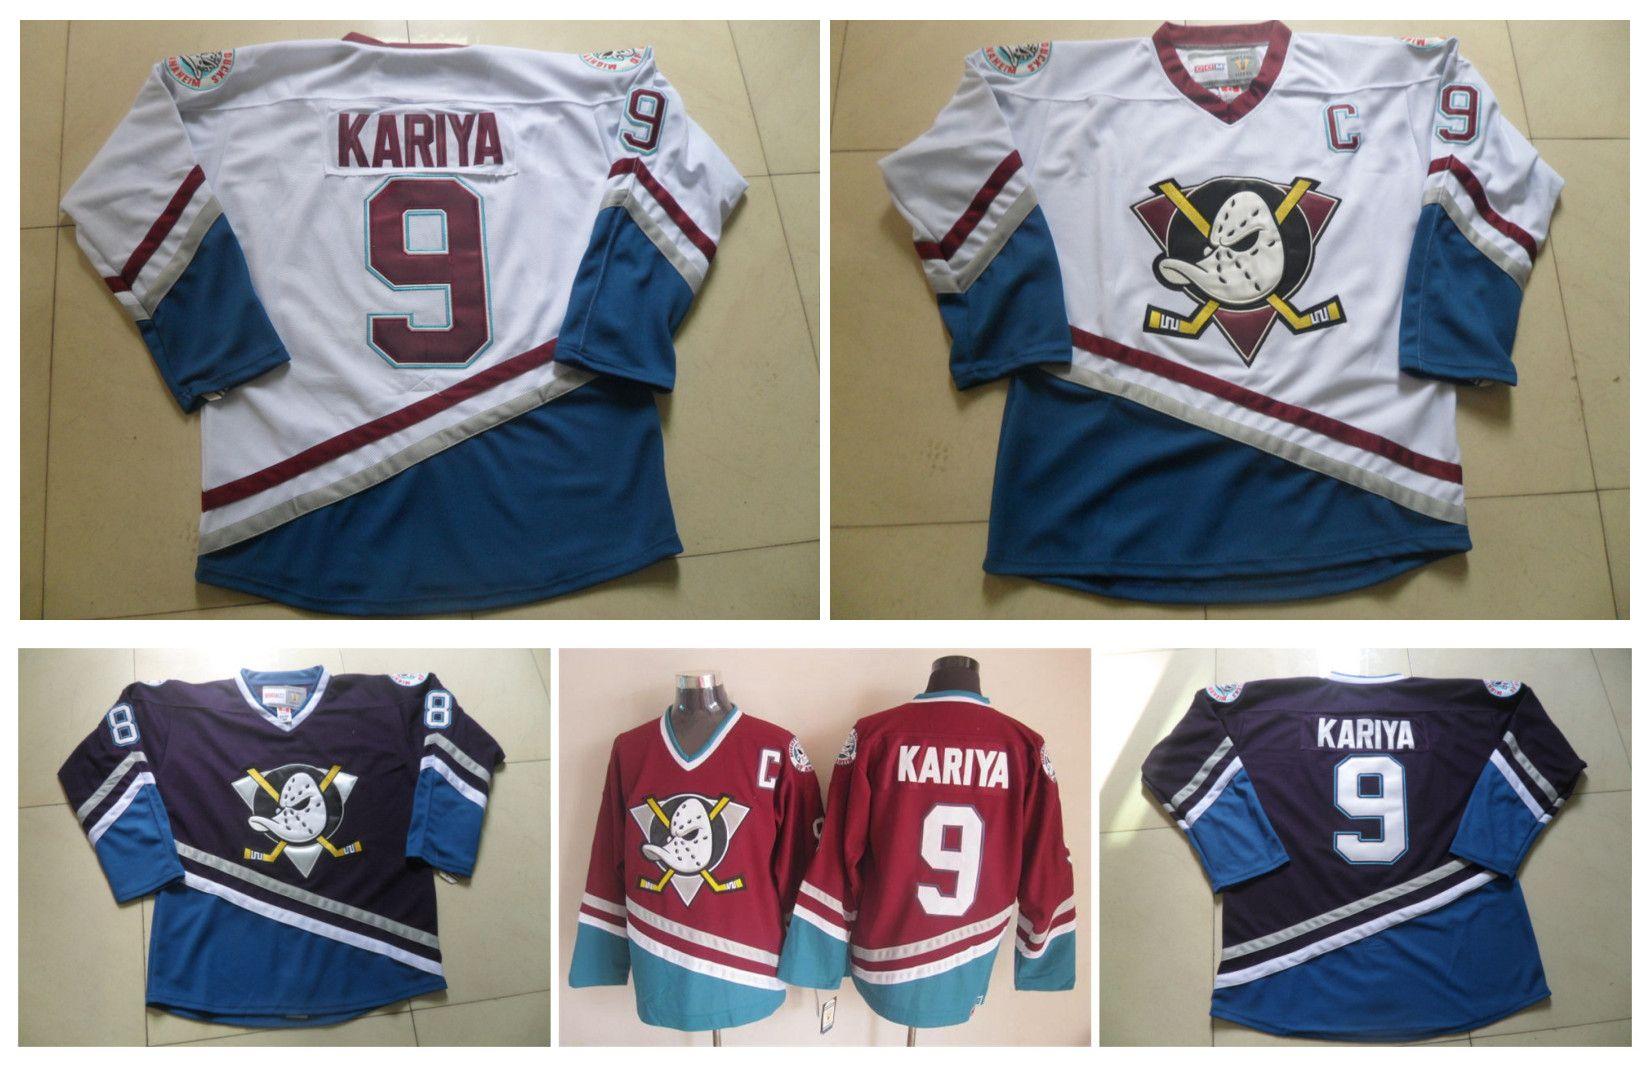 Hóquei no Gelo dos homens CCM Jersey Barato Mighty Patos # 9 Paul Kariya Jersey Retro Vintage Costurado Logotipo China Anaheim Ducks Jerseys